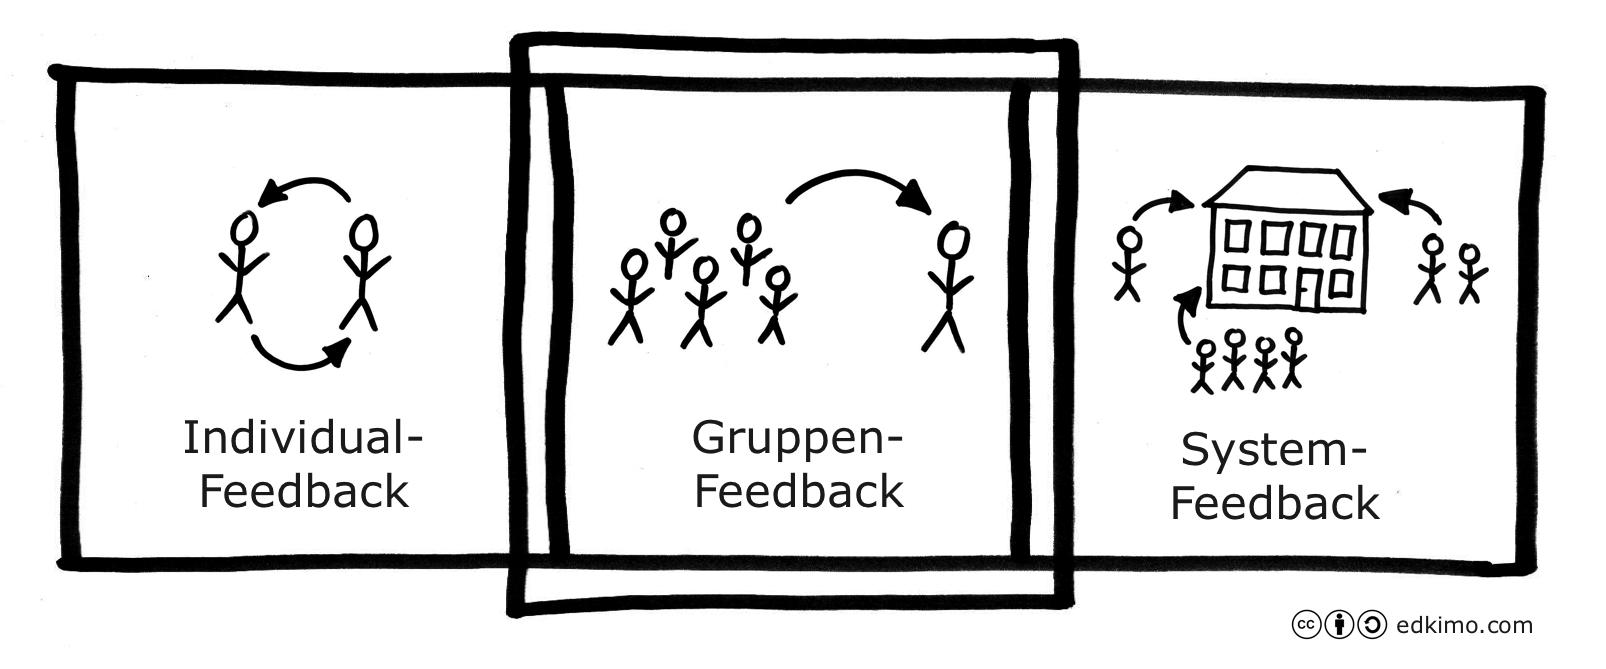 Schülerfeedback-Feedback-Formen_Individual-Gruppen-System-Feedback_Edkimo